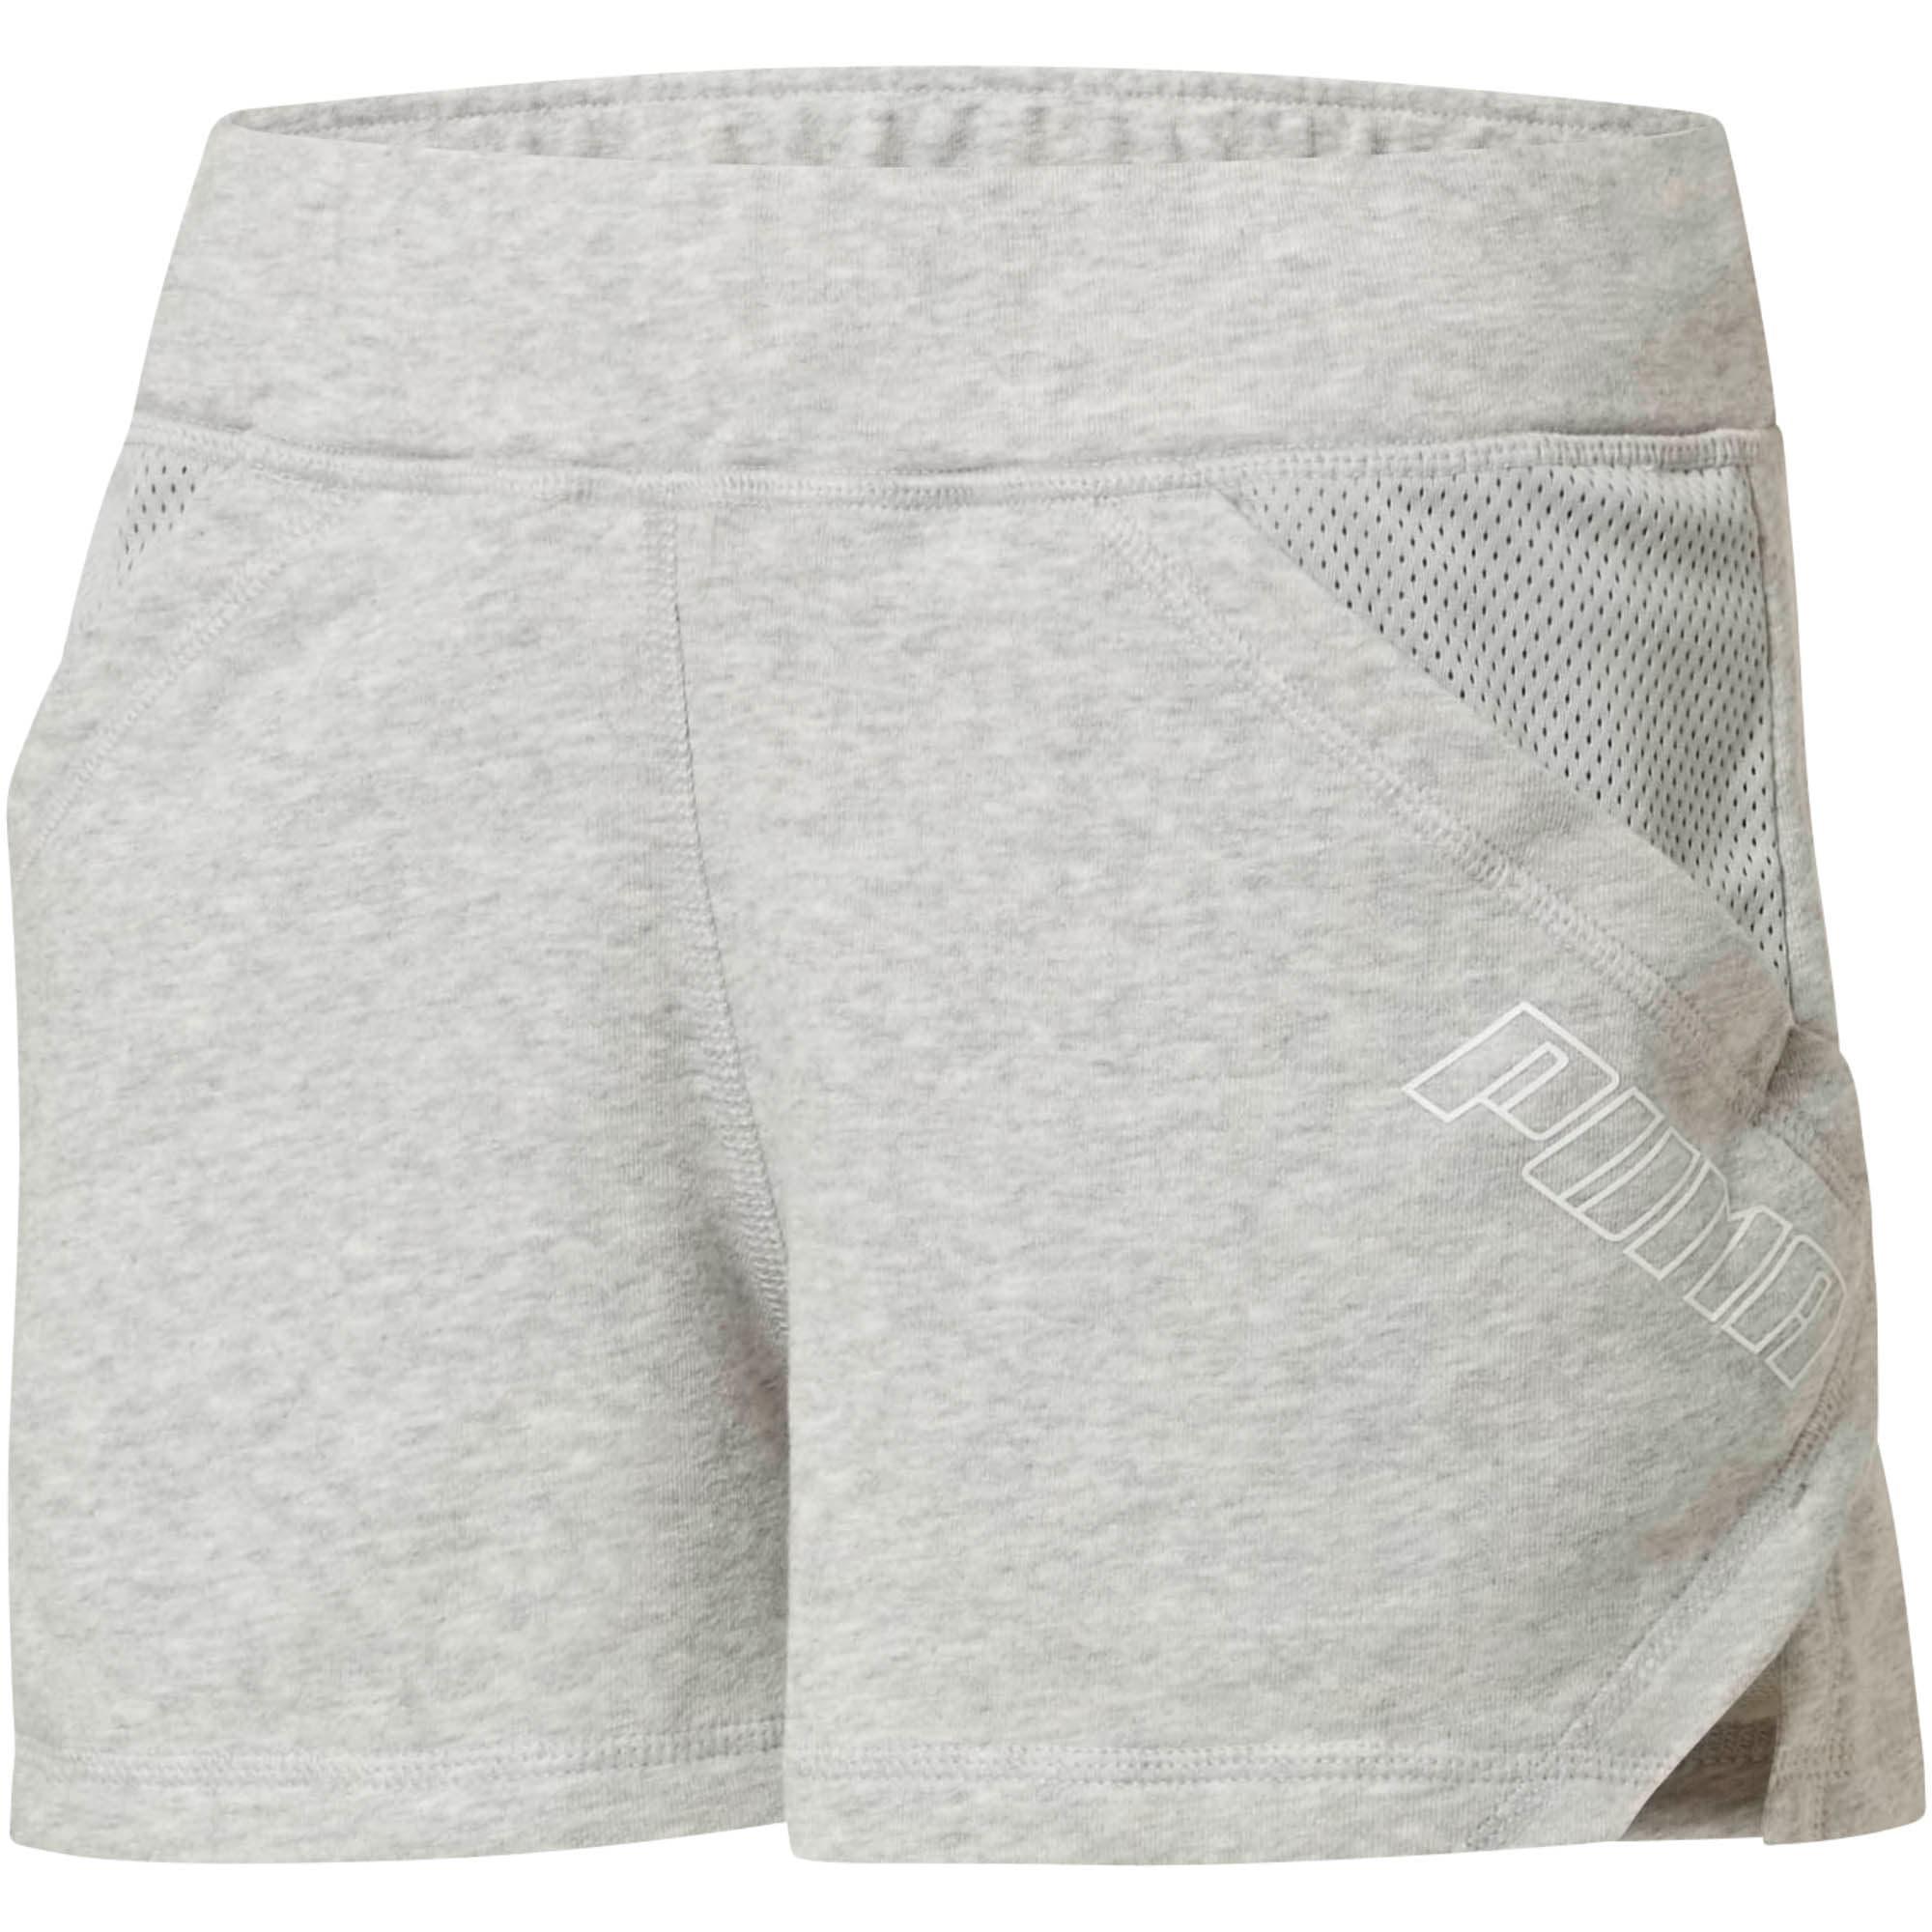 "Thumbnail 2 of Yogini Women's 3"" Shorts, Light Gray Heather, medium"